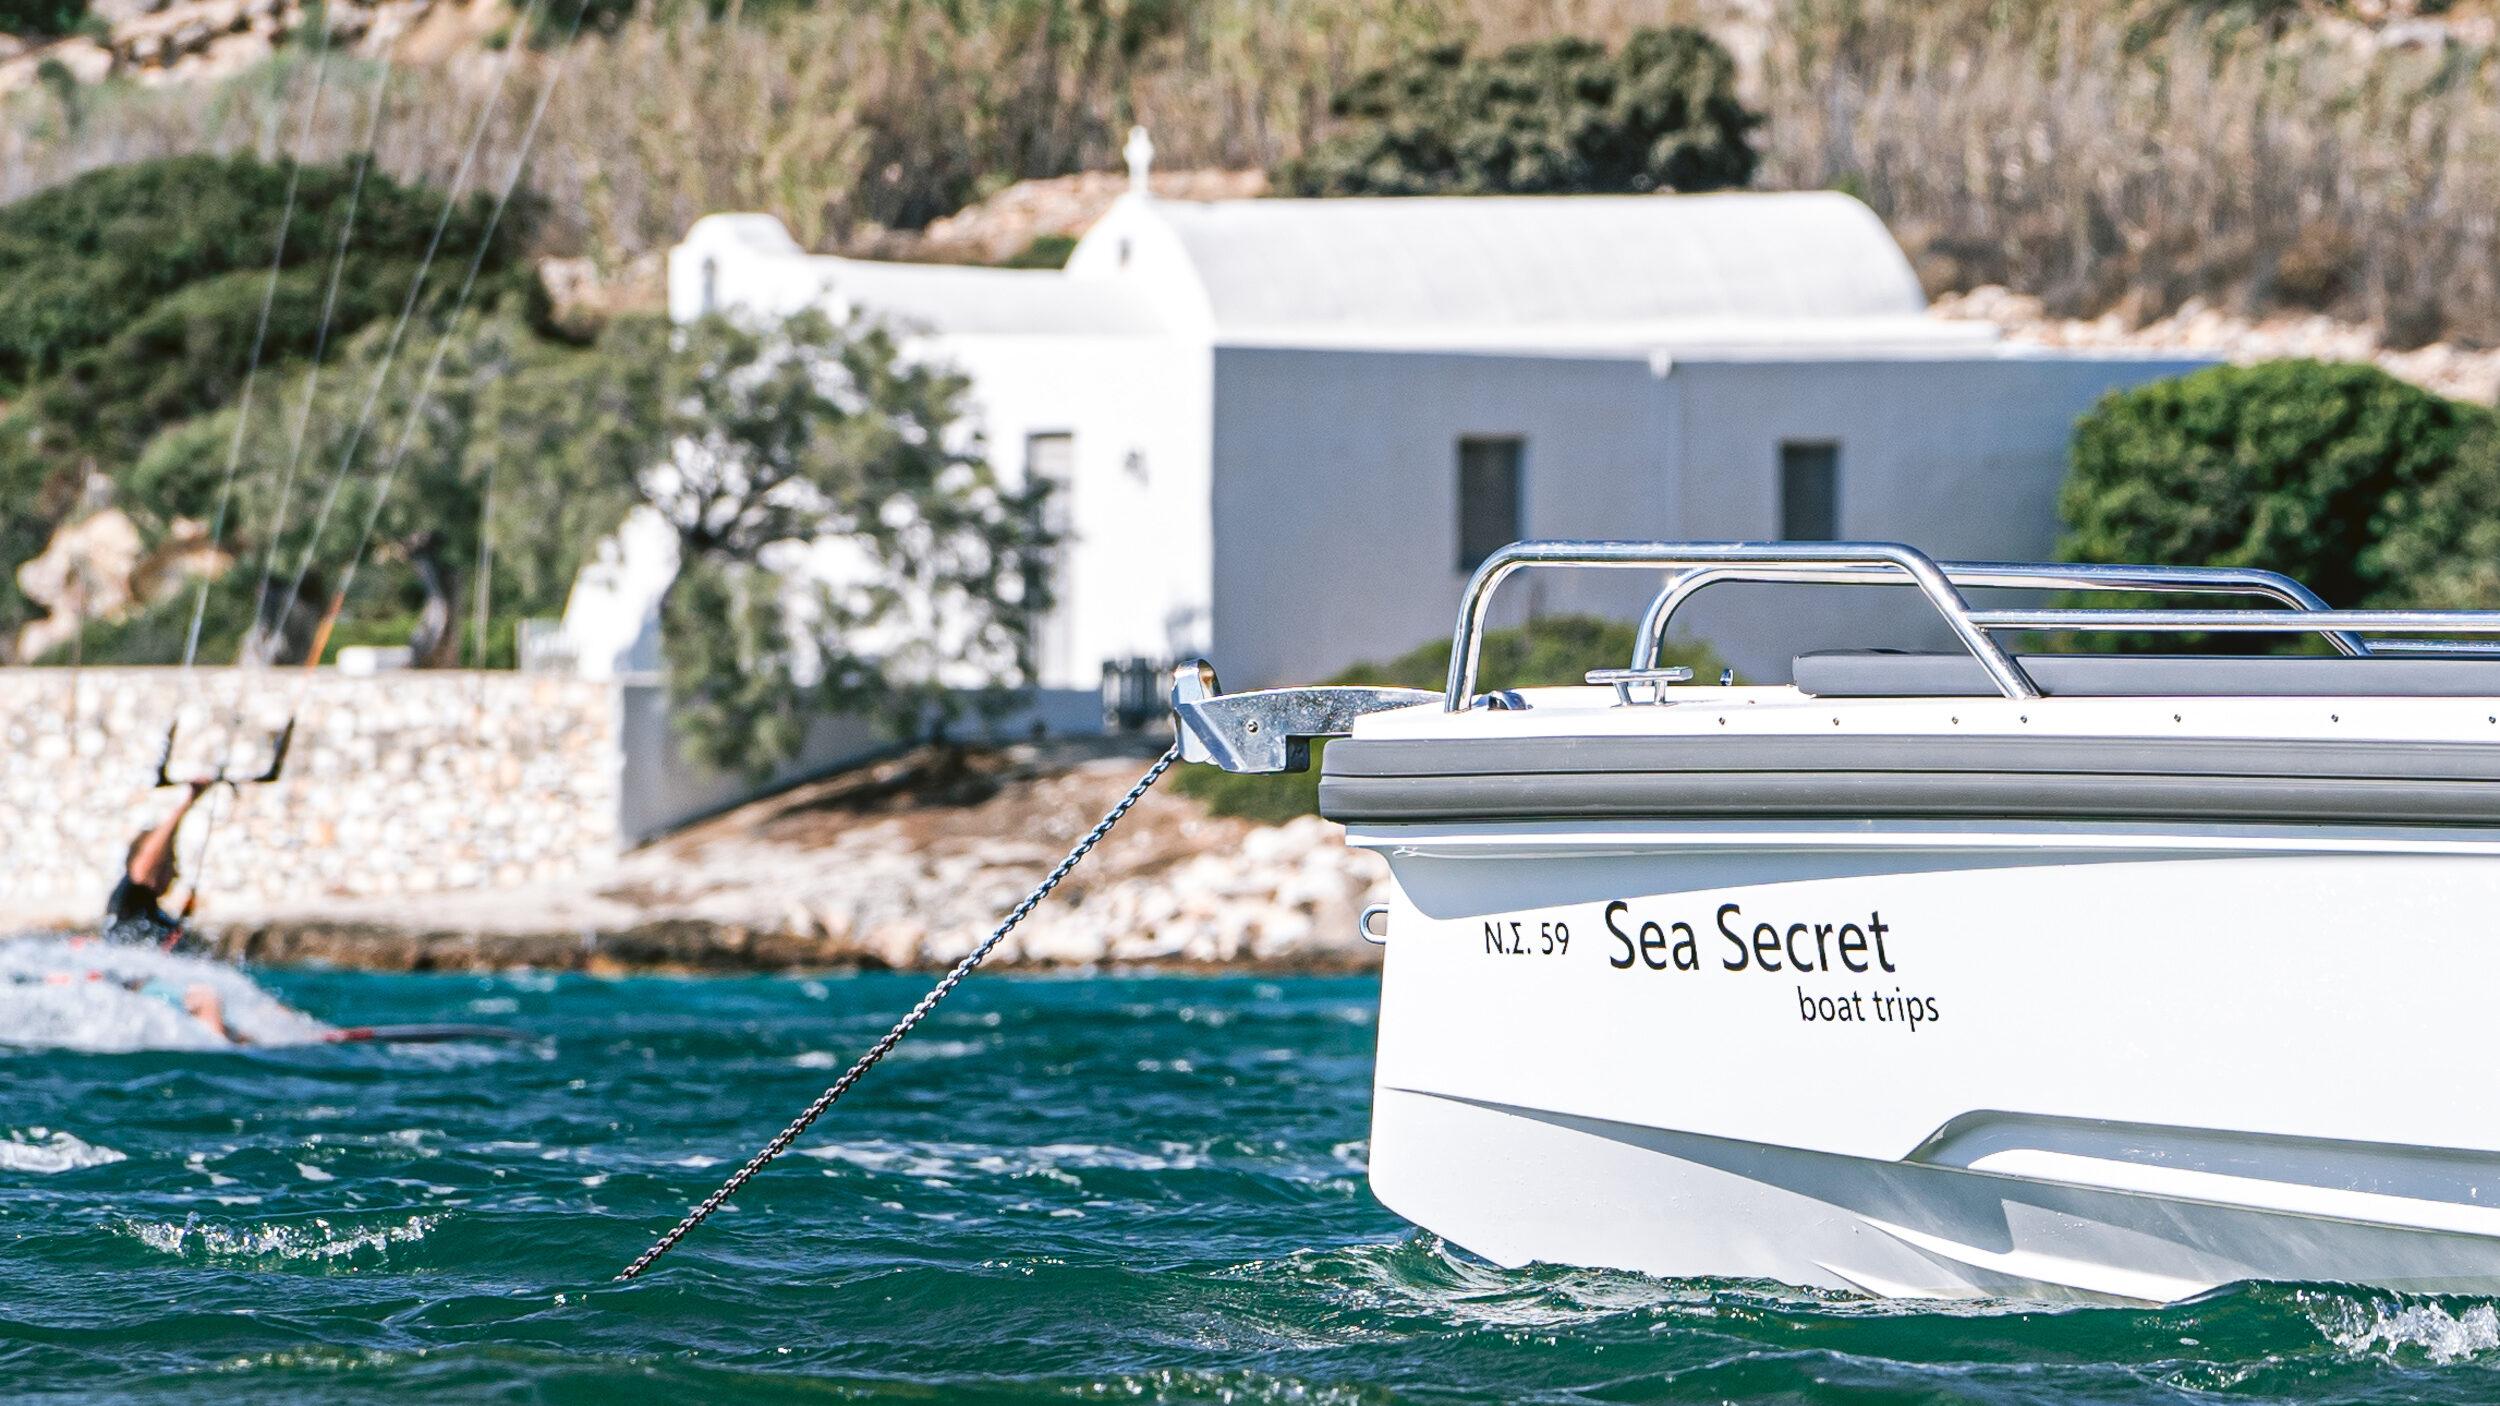 seasecret boat trips boot touren naxos greece griechenland urlaub ferien sommer wassersport kitesurfen axopar 28 TT